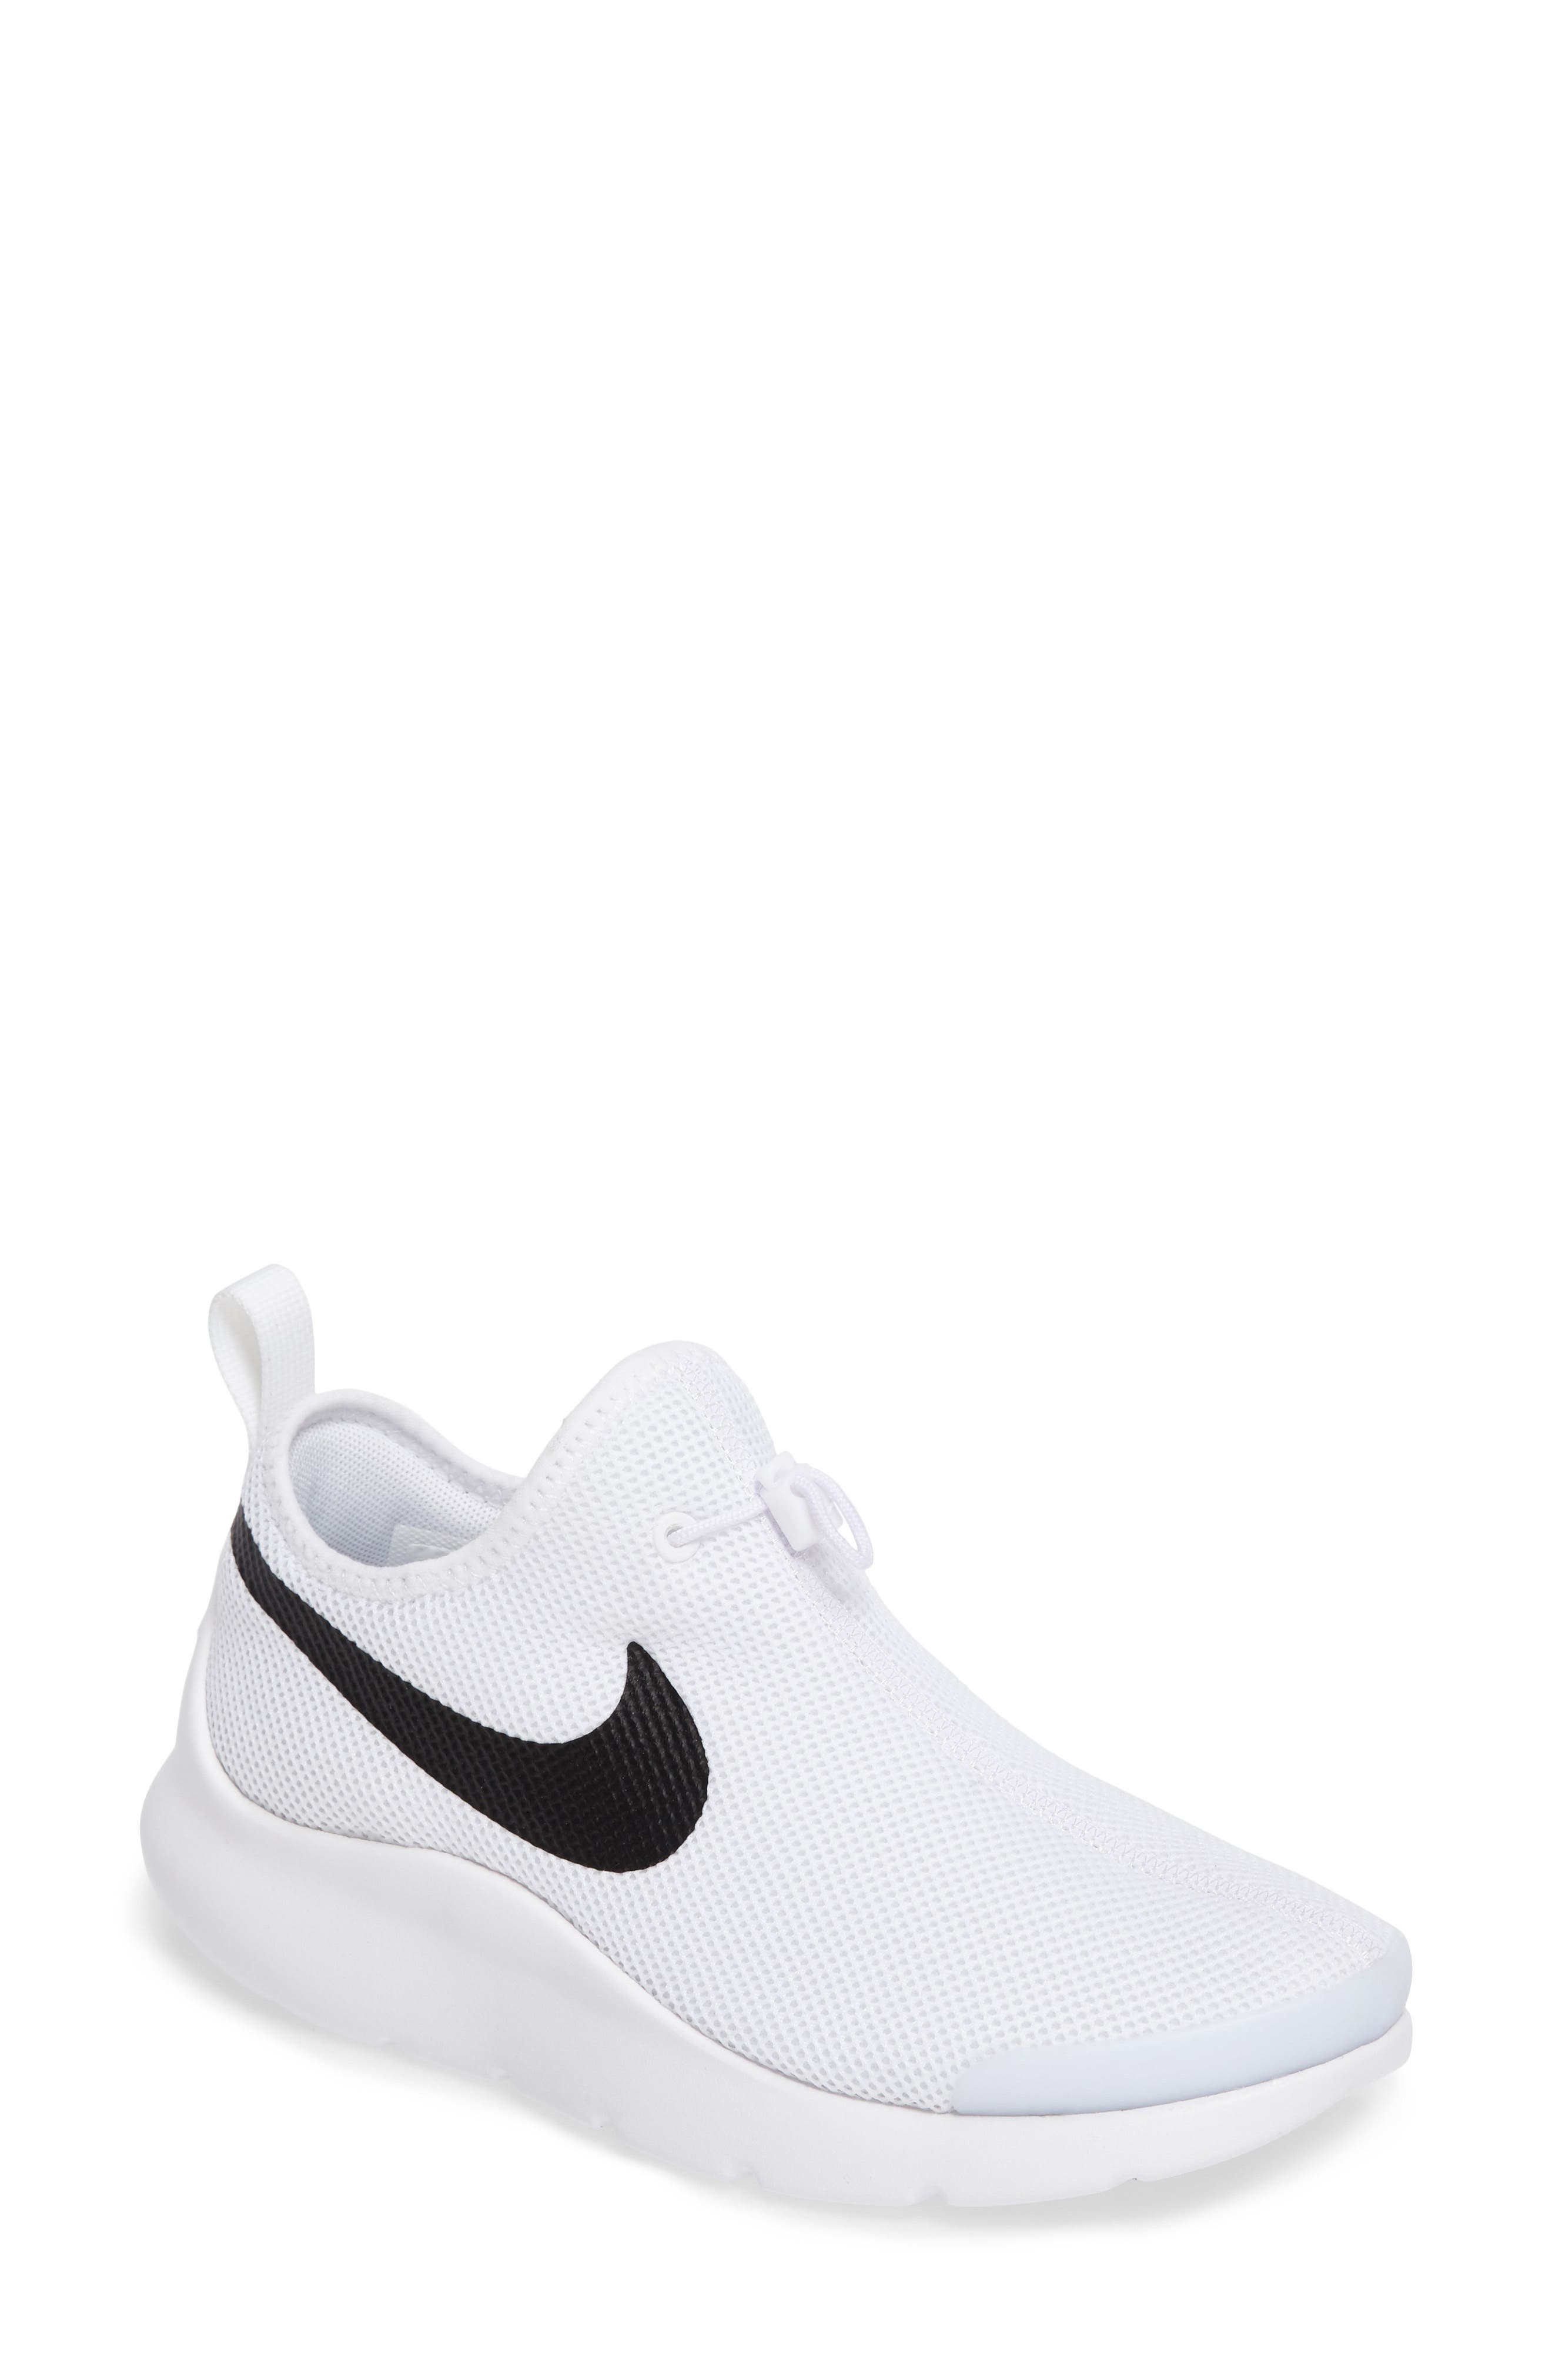 Main Image - Nike Aptare Slip-On Mesh Sneaker (Women)